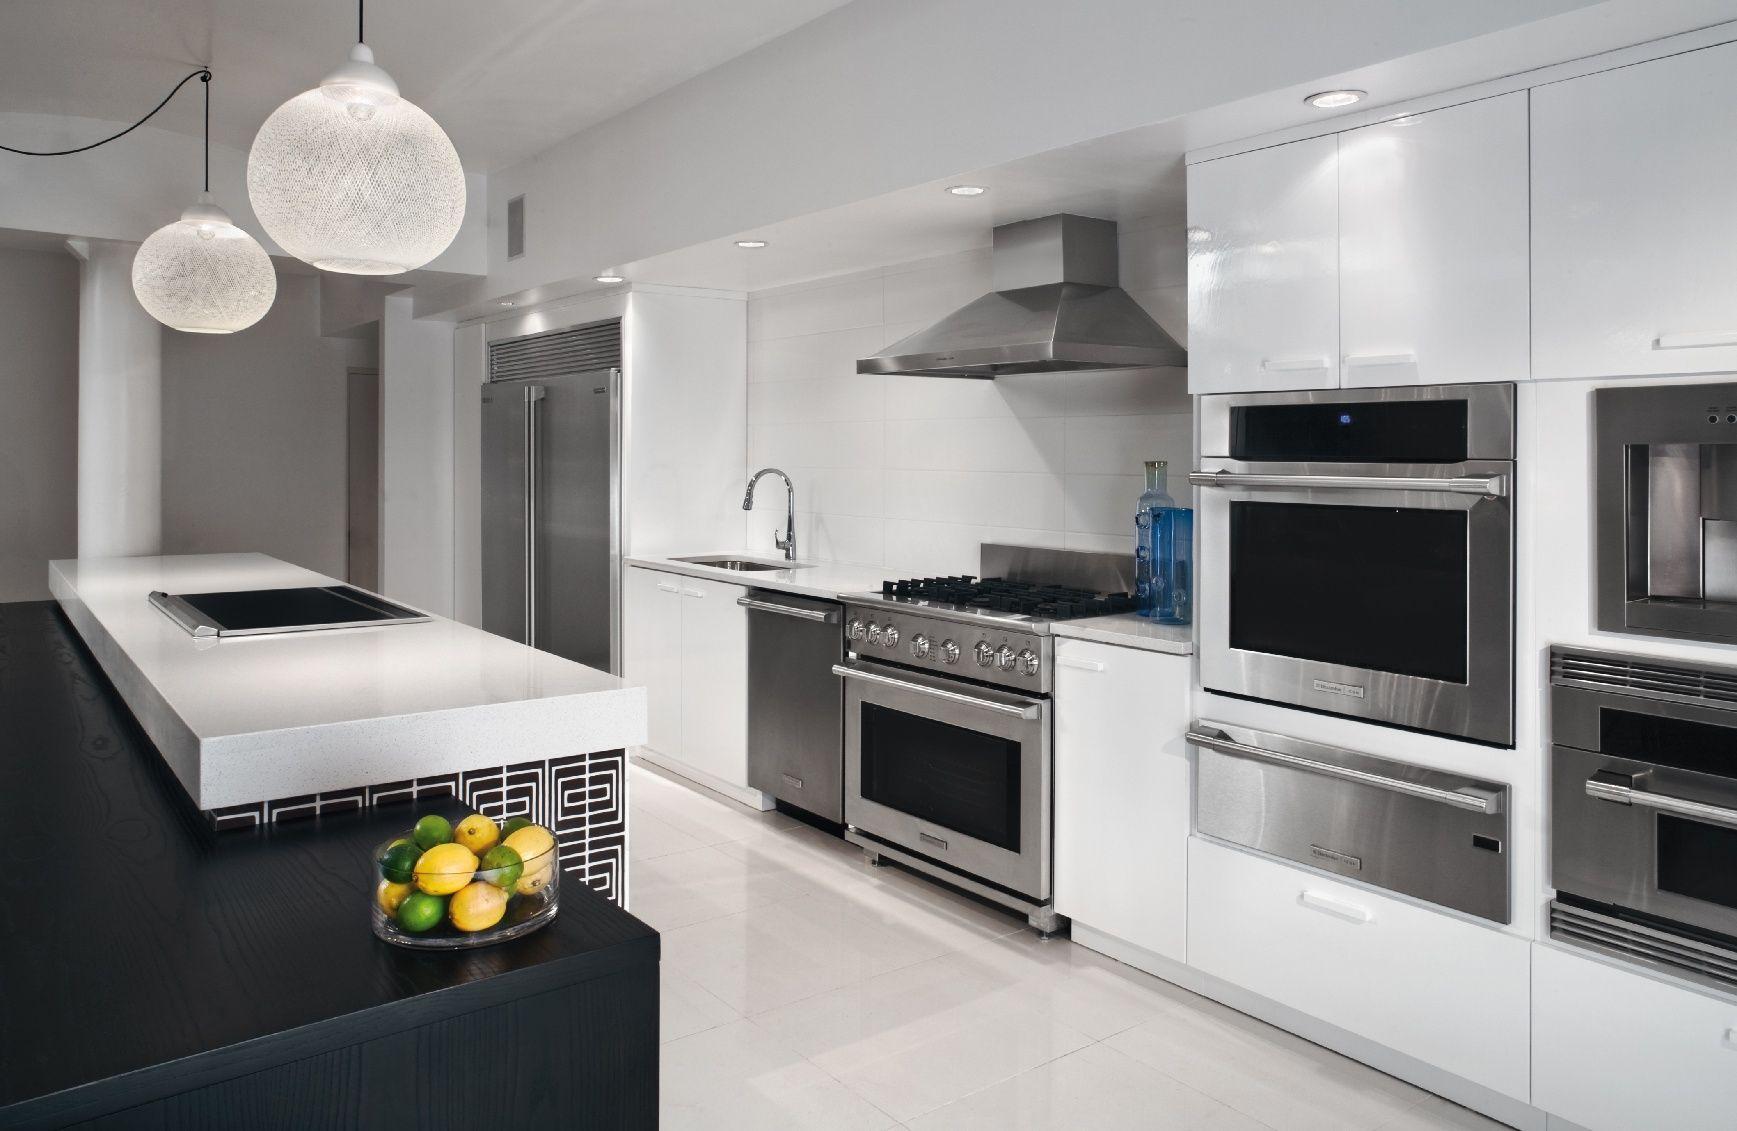 Uncategorized Best Affordable Kitchen Appliances the 5 best affordable luxury appliance brands reviewsratings kitchen appliances